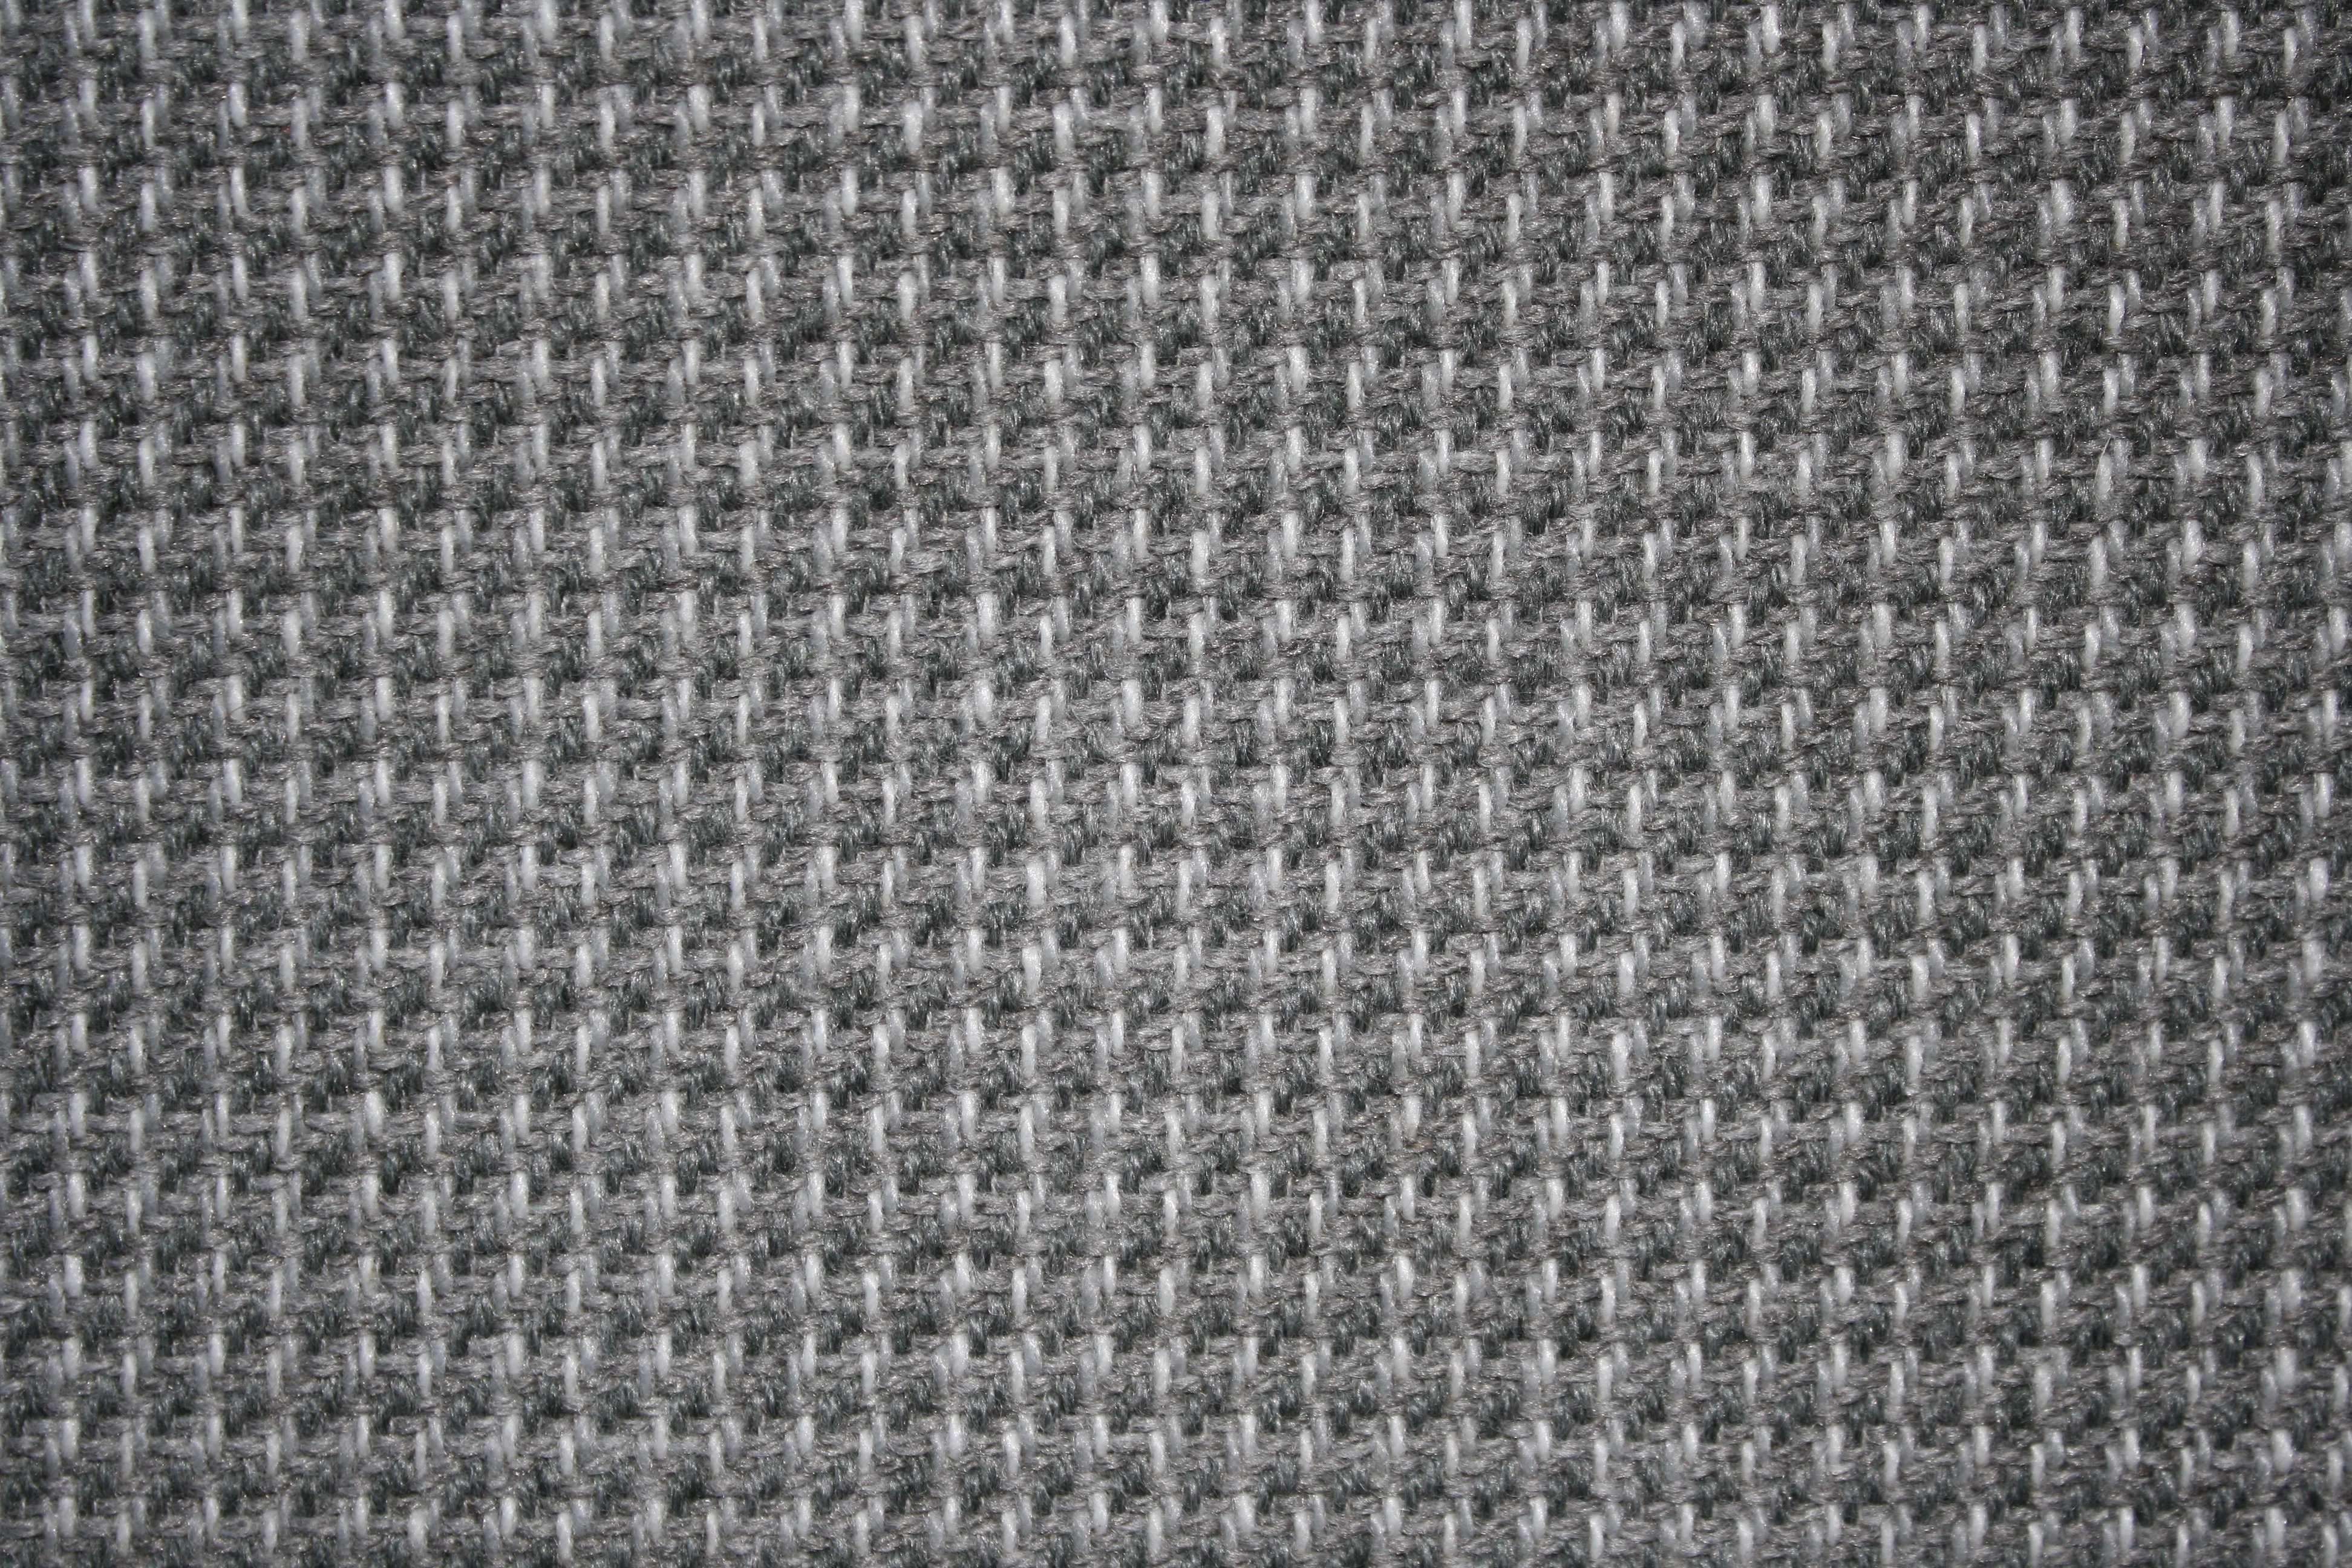 grey sofa fabric texture 2 seater leather ikea gray upholstery  photos public domain